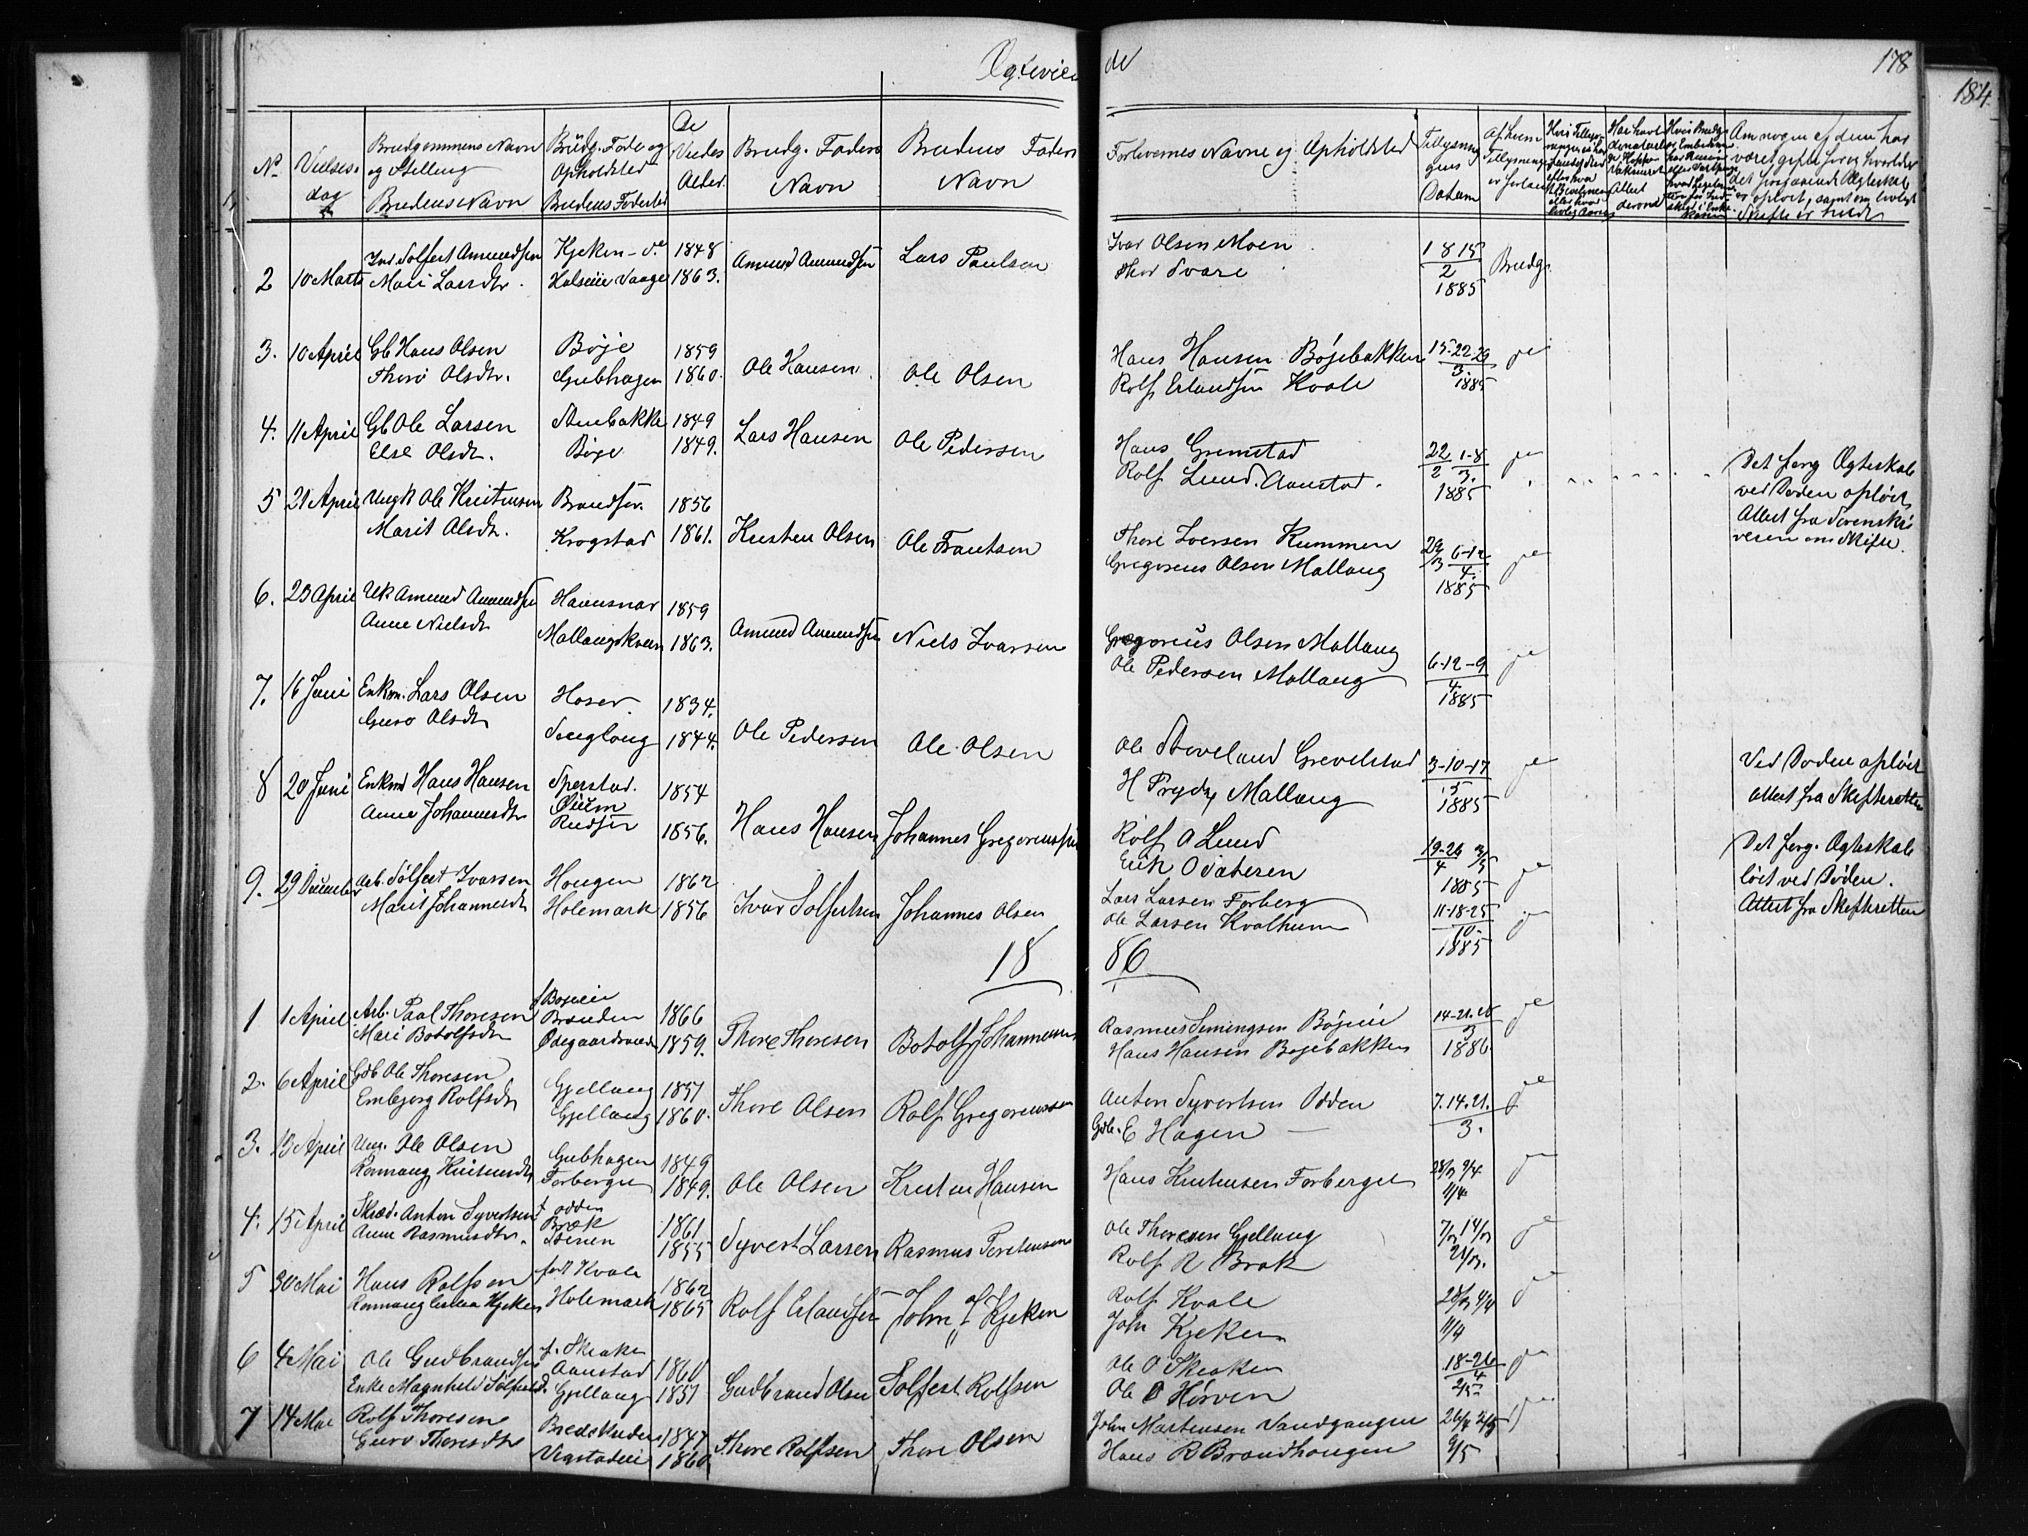 SAH, Skjåk prestekontor, Klokkerbok nr. 1, 1865-1893, s. 178